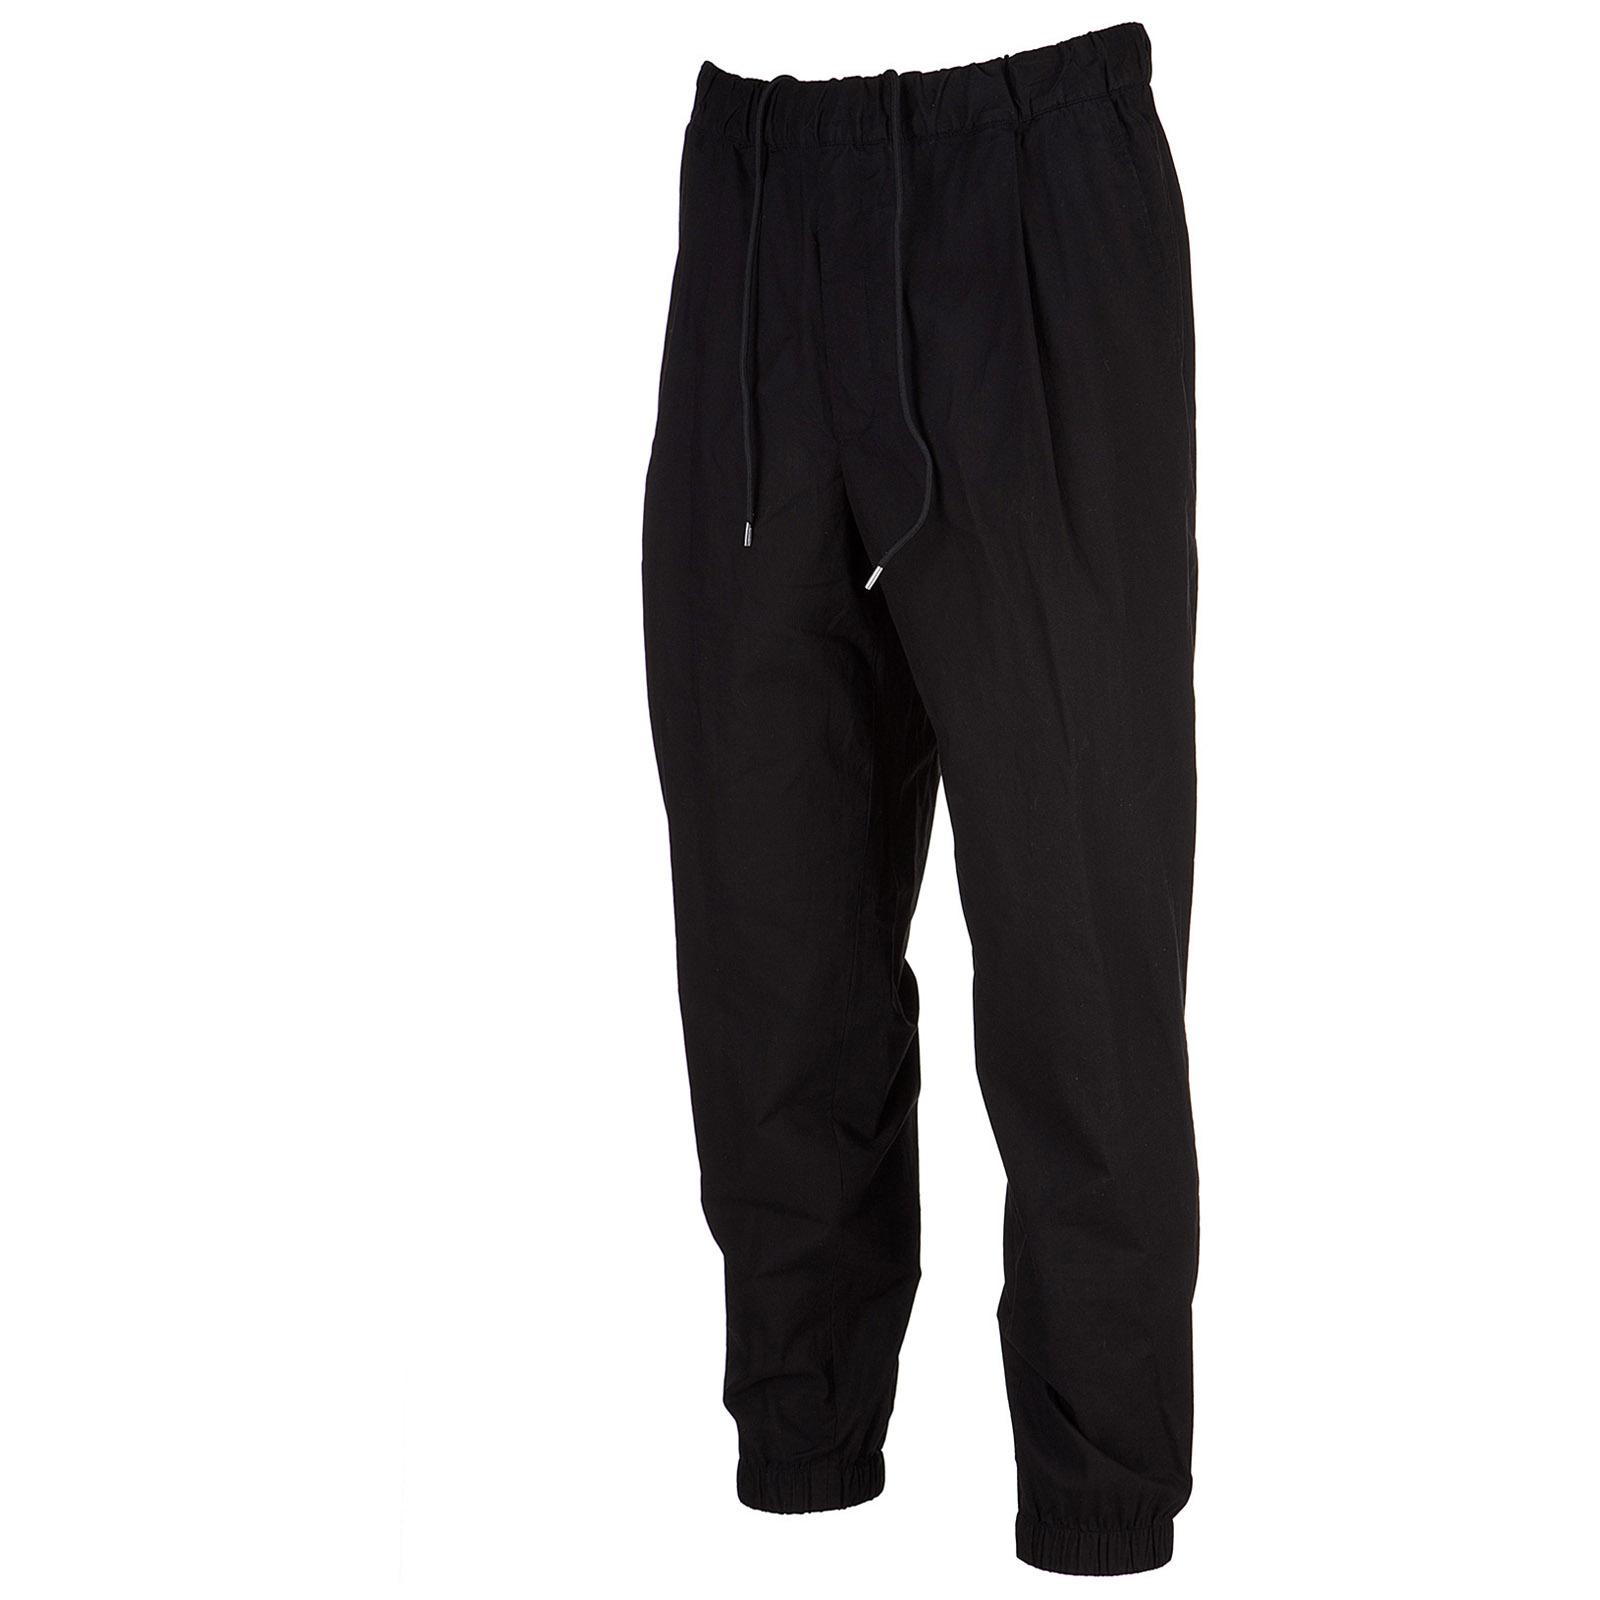 Pantalon homme chino trackpant